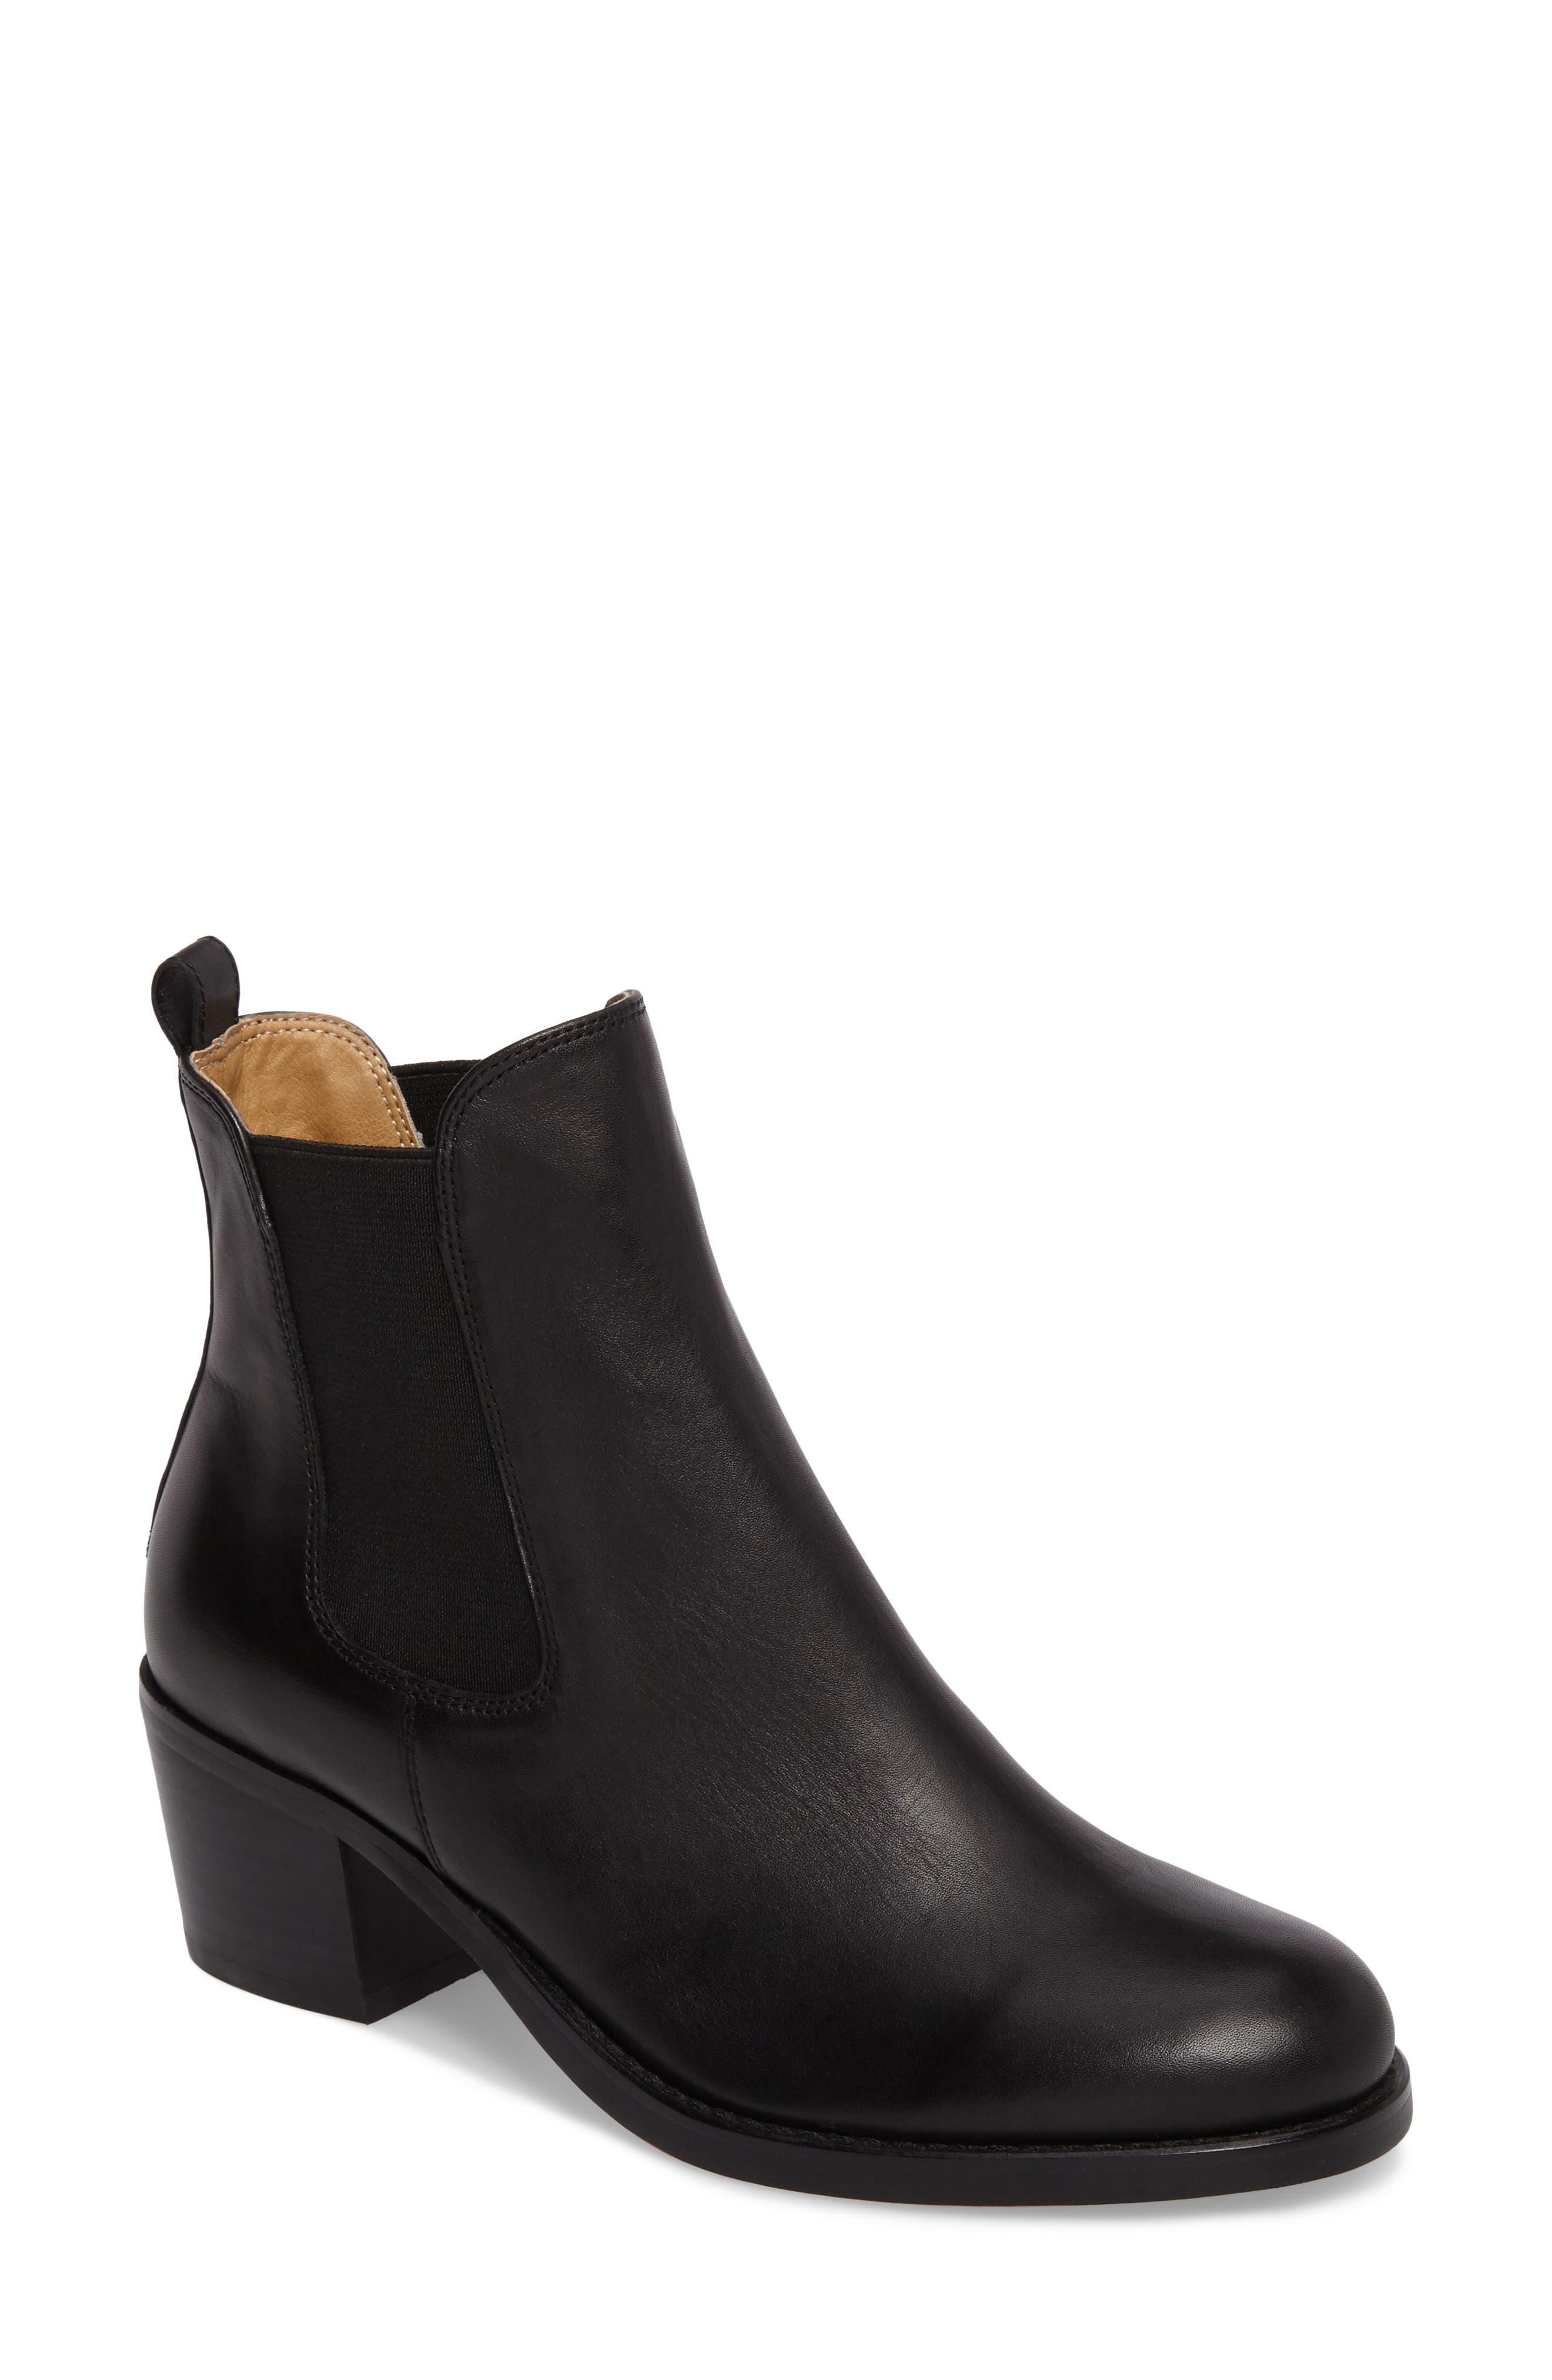 Joshua Block Heel Bootie,                         Main,                         color, Black Albany Leather